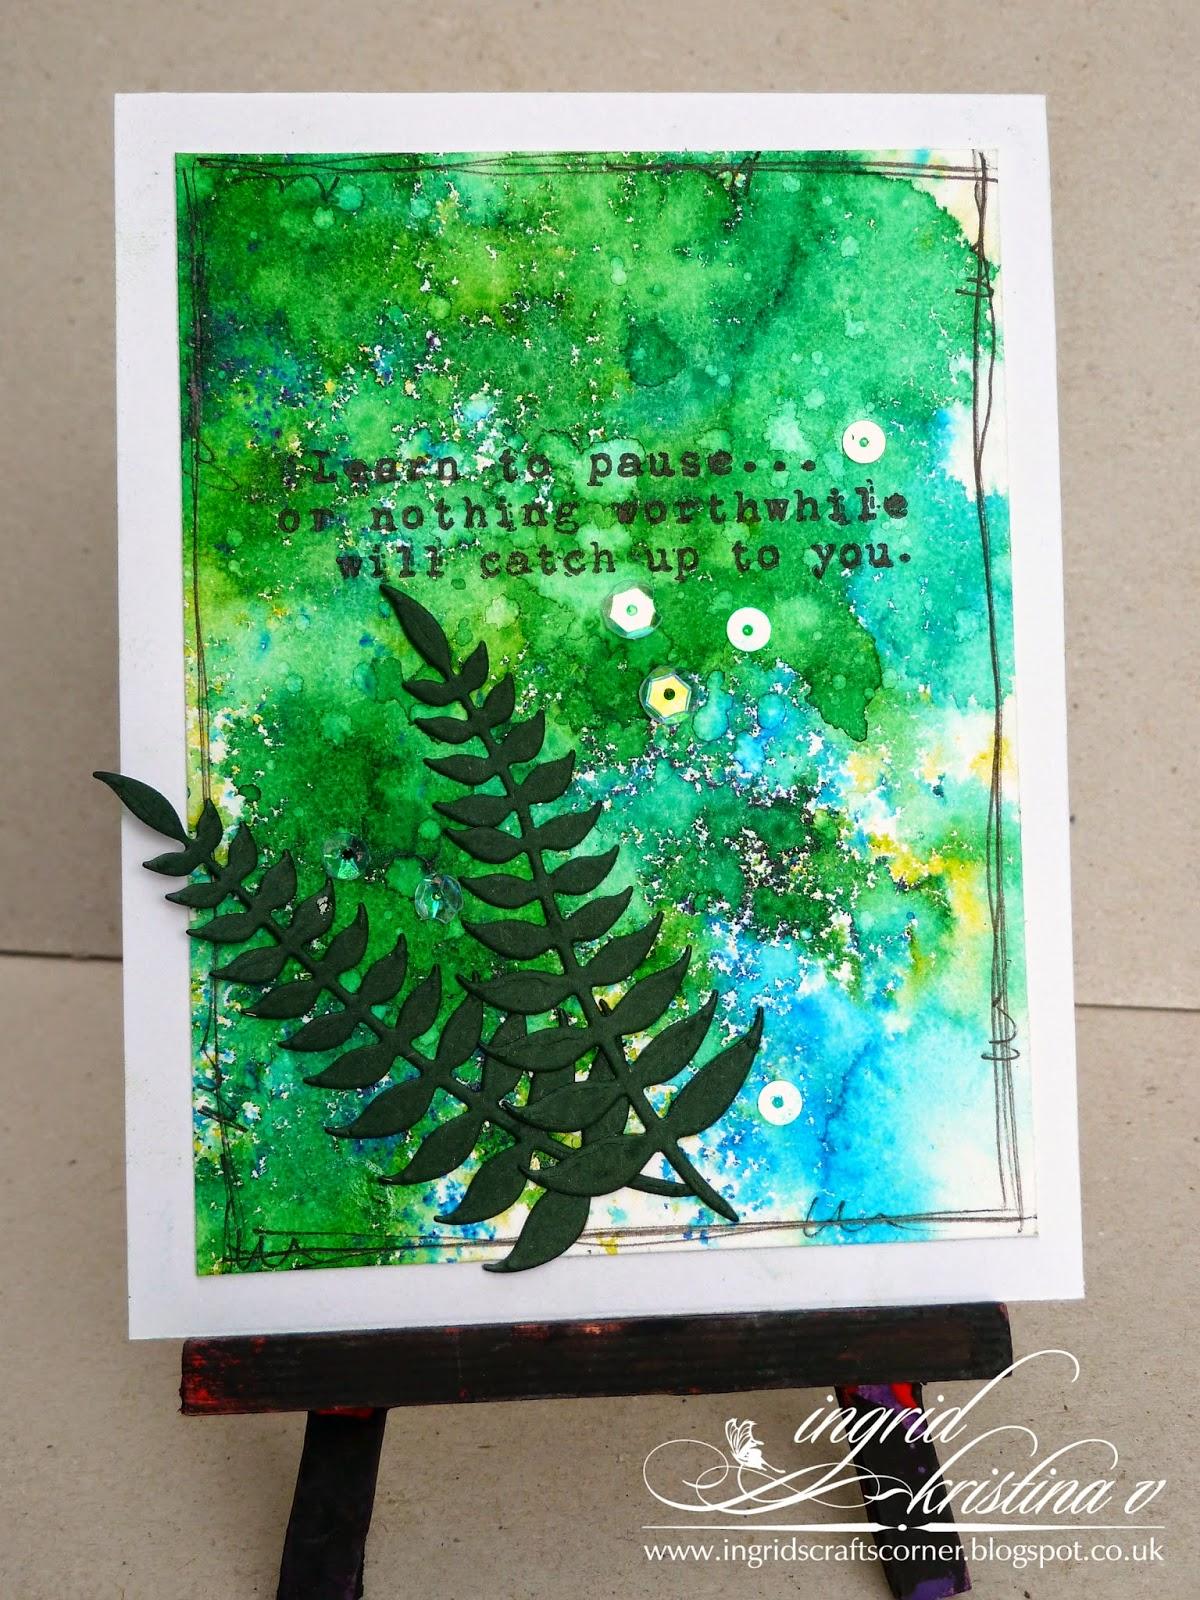 http://ingridscraftscorner.blogspot.co.uk/2014/09/speed-craft-challenge-2-colour-themed.html